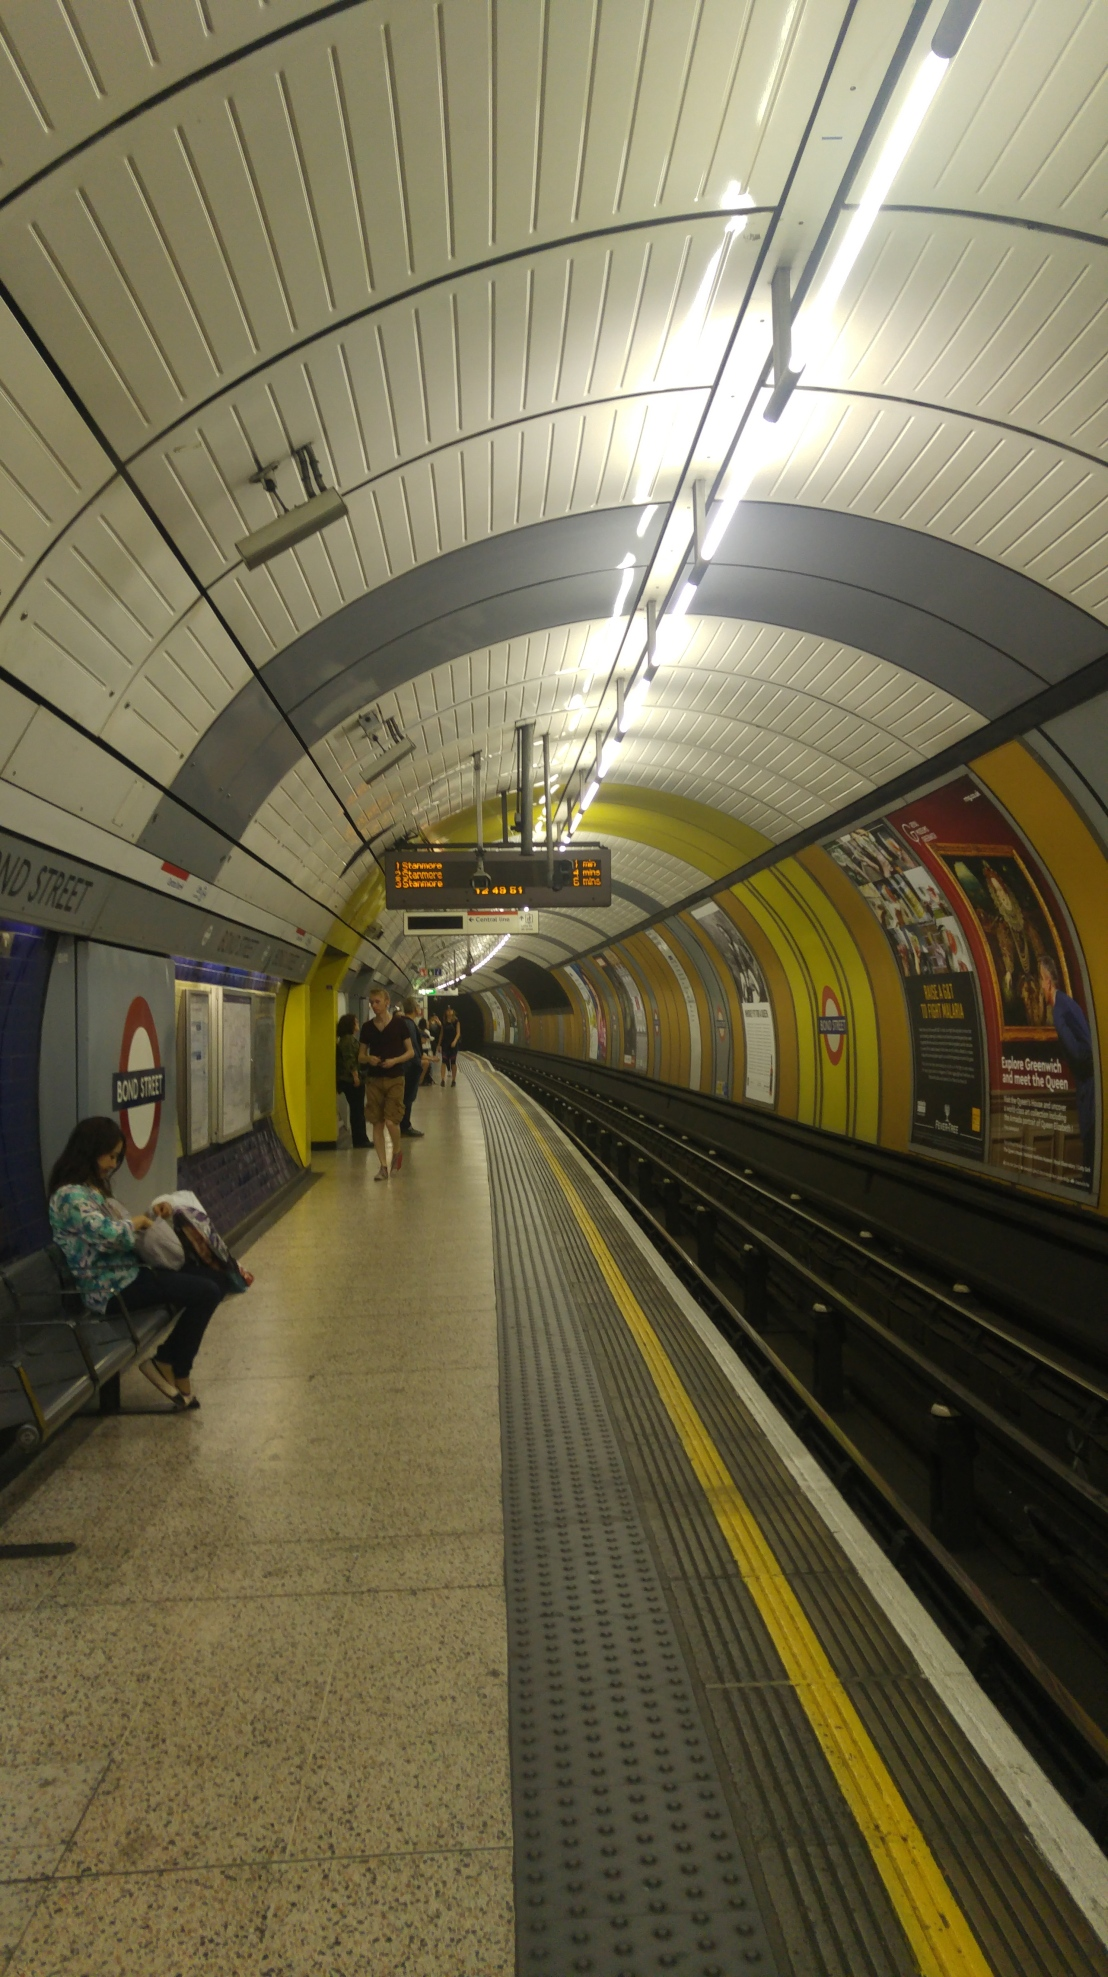 London trip - the tube